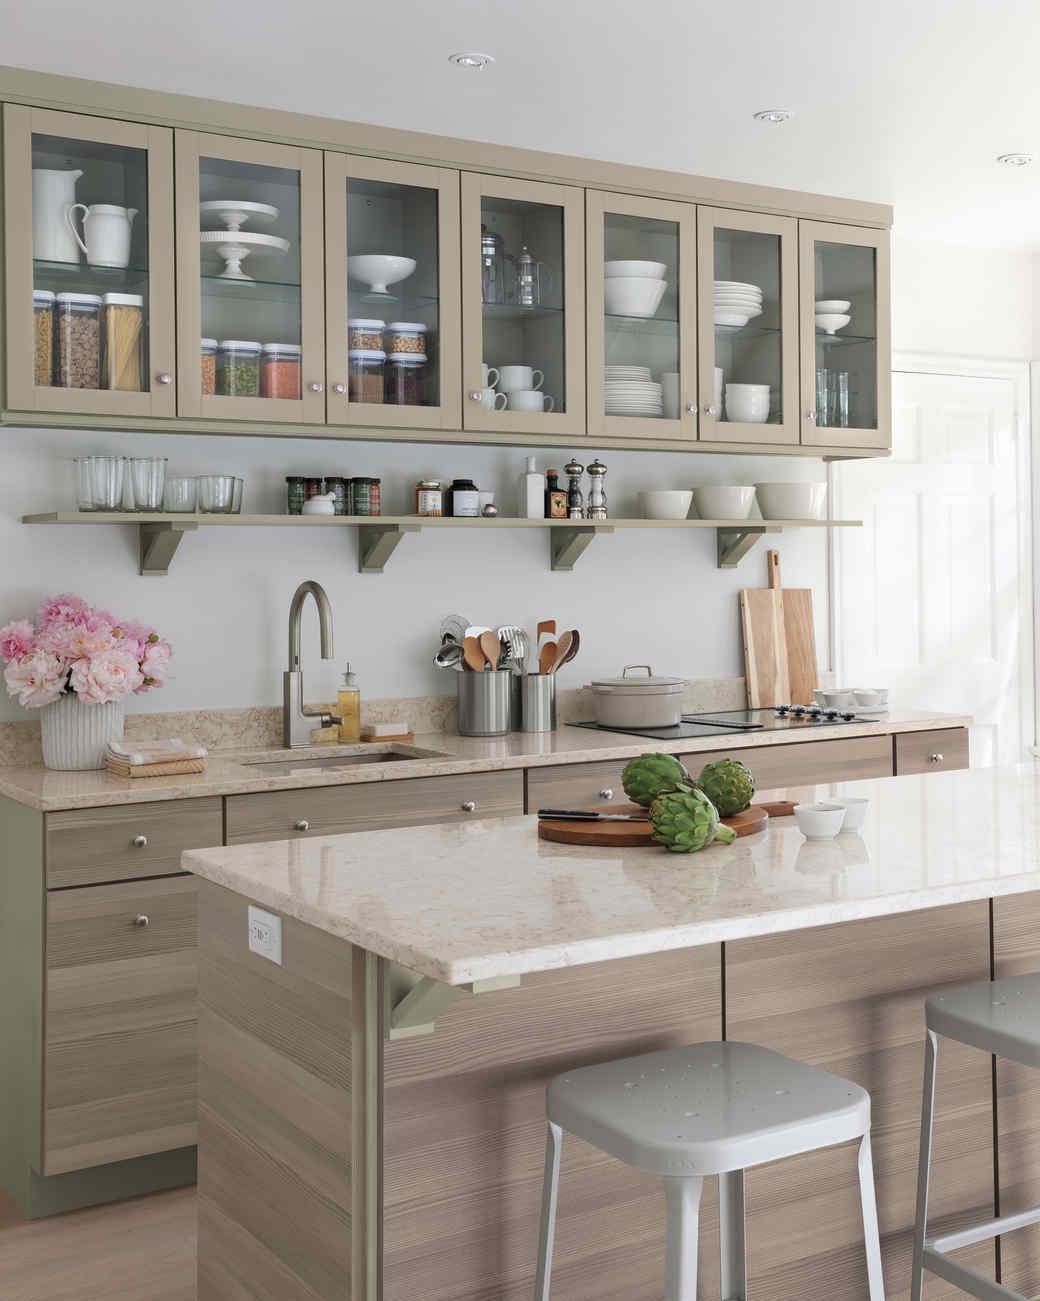 Using Home Depot For Major Kitchen Remodel